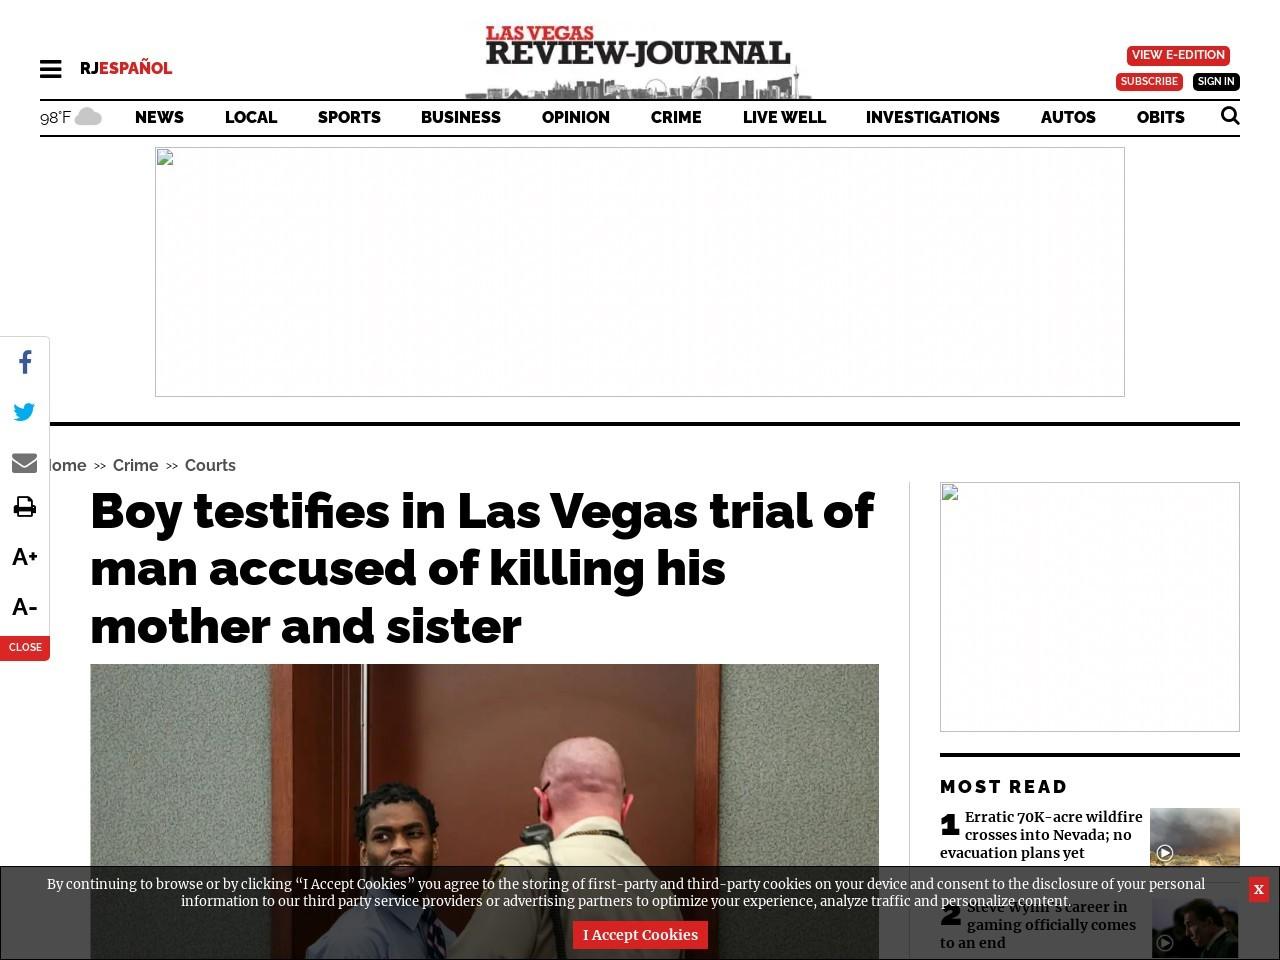 Boy testifies in Las Vegas trial of man accused of killing his mother and sister